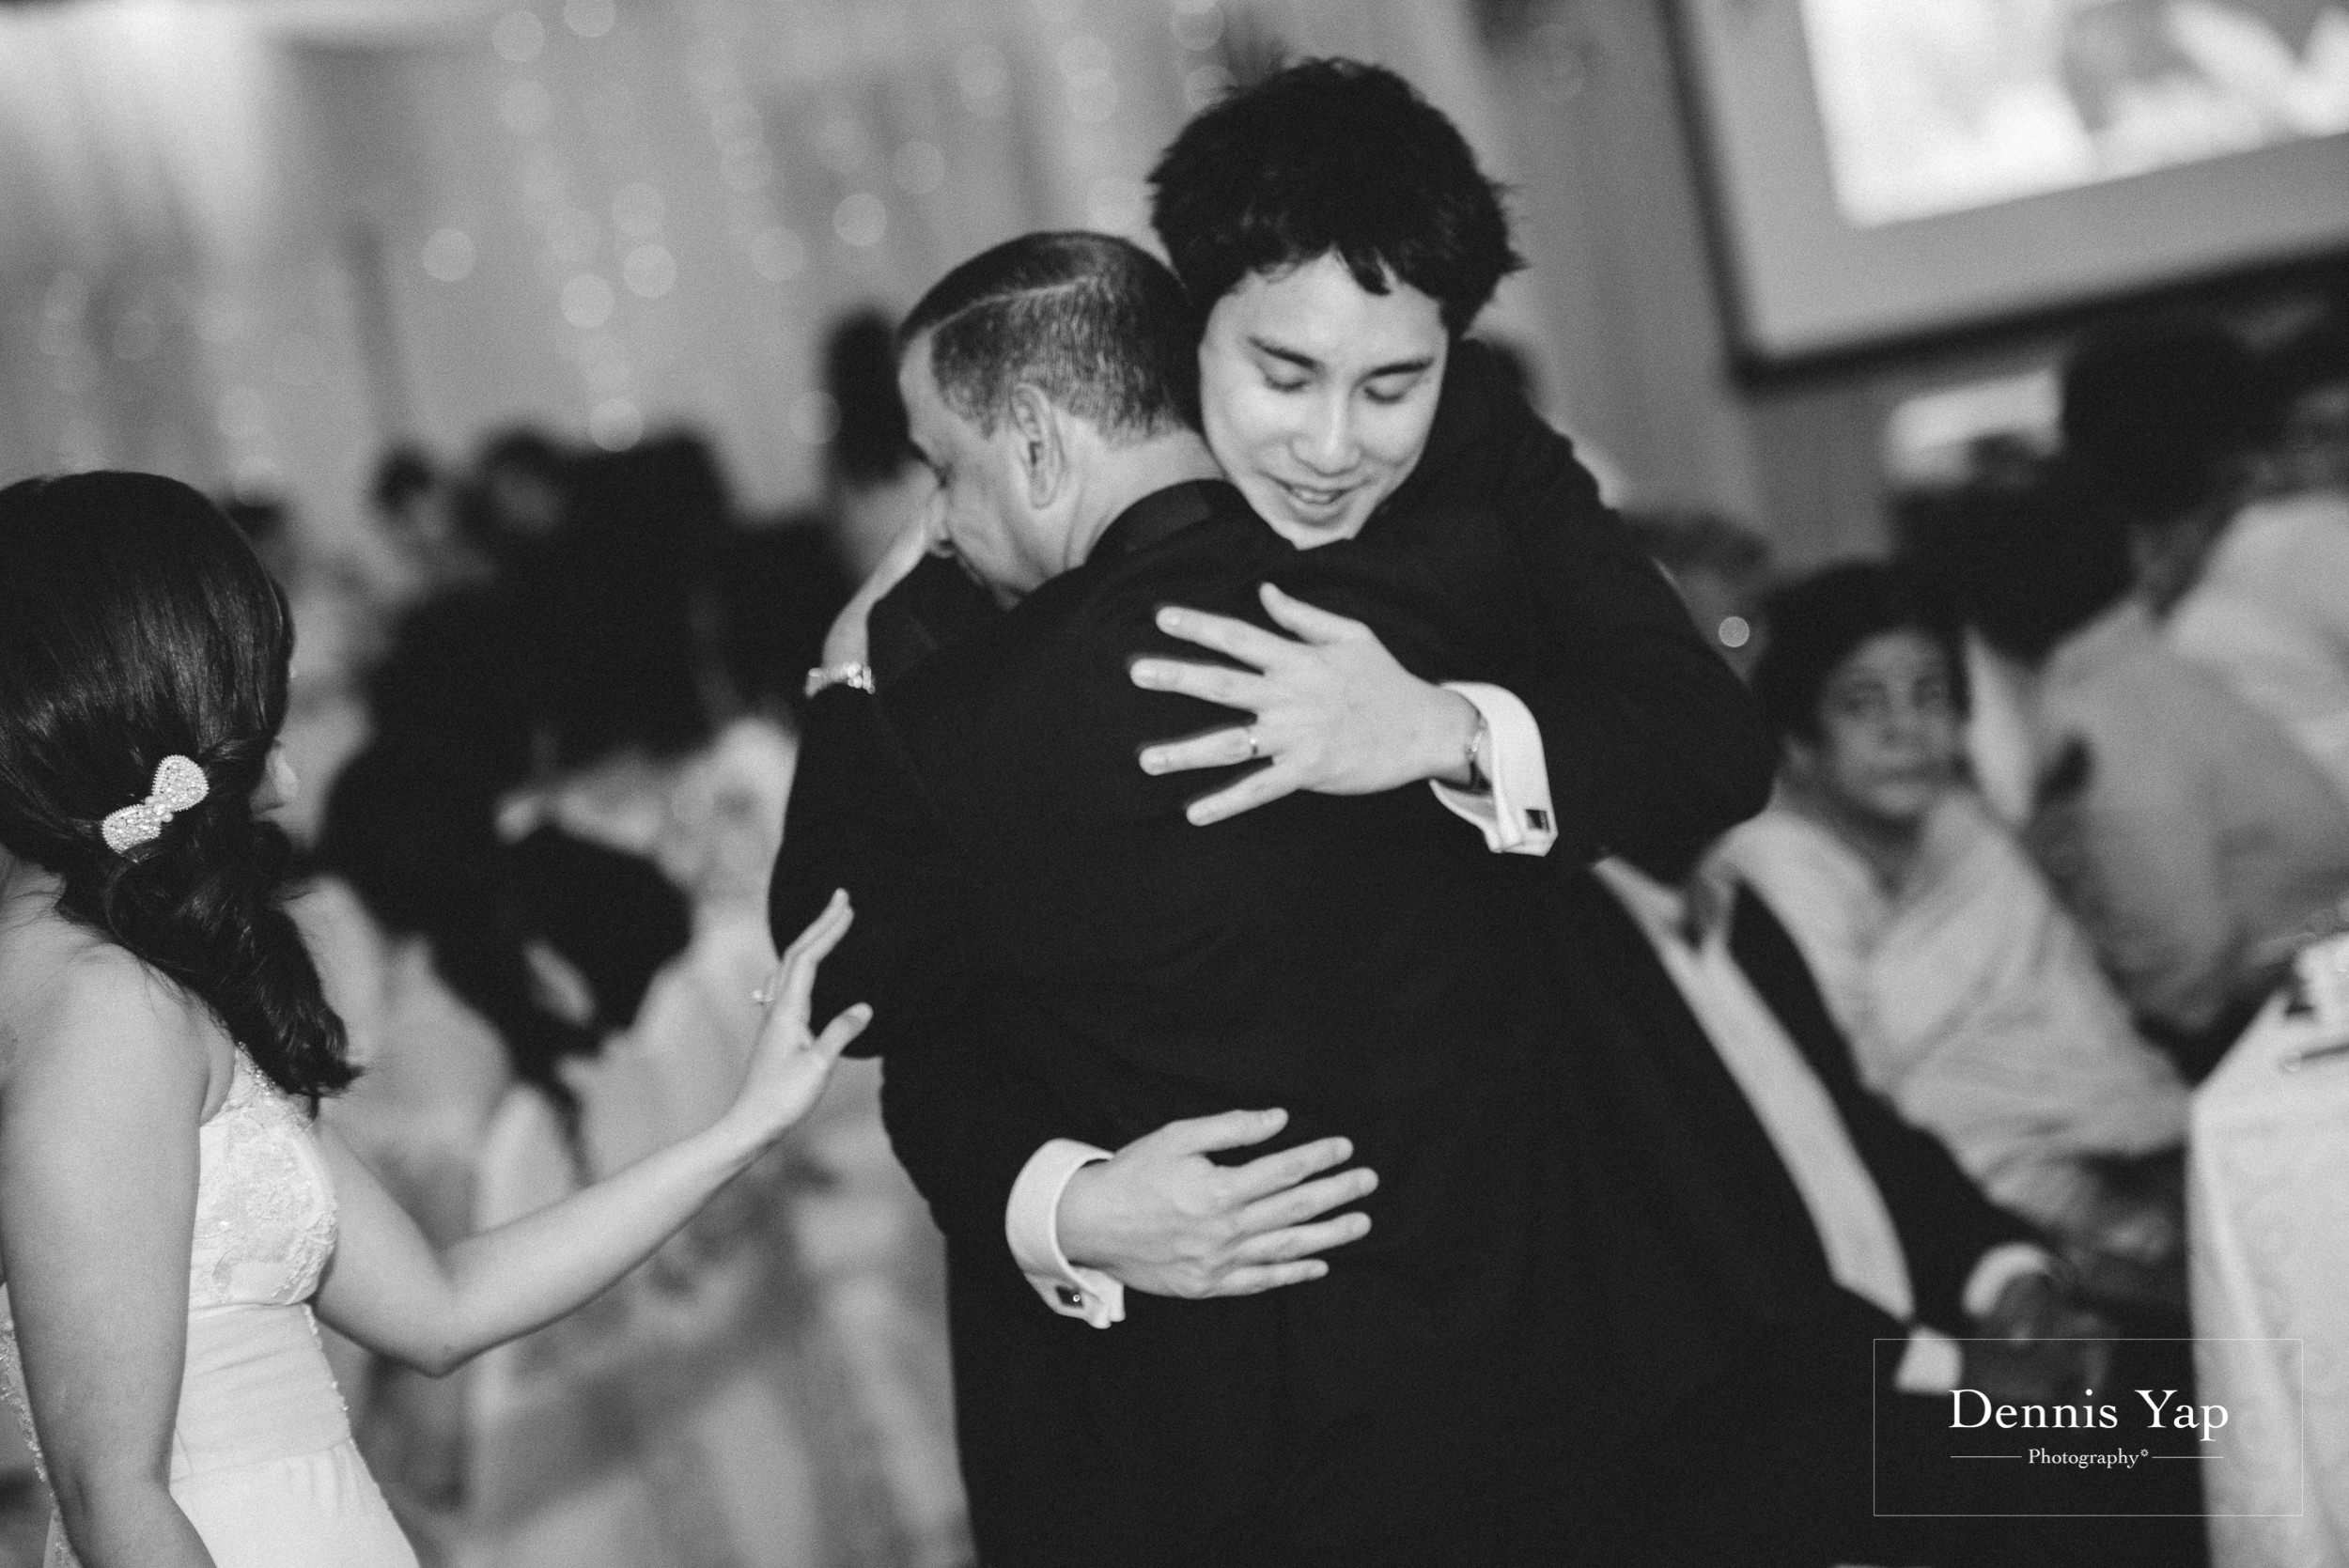 shalini yelitte wedding dinner rasa sayang resort penang dennis yap photography malaysia top wedding photographer beloved emotions flow -32.jpg